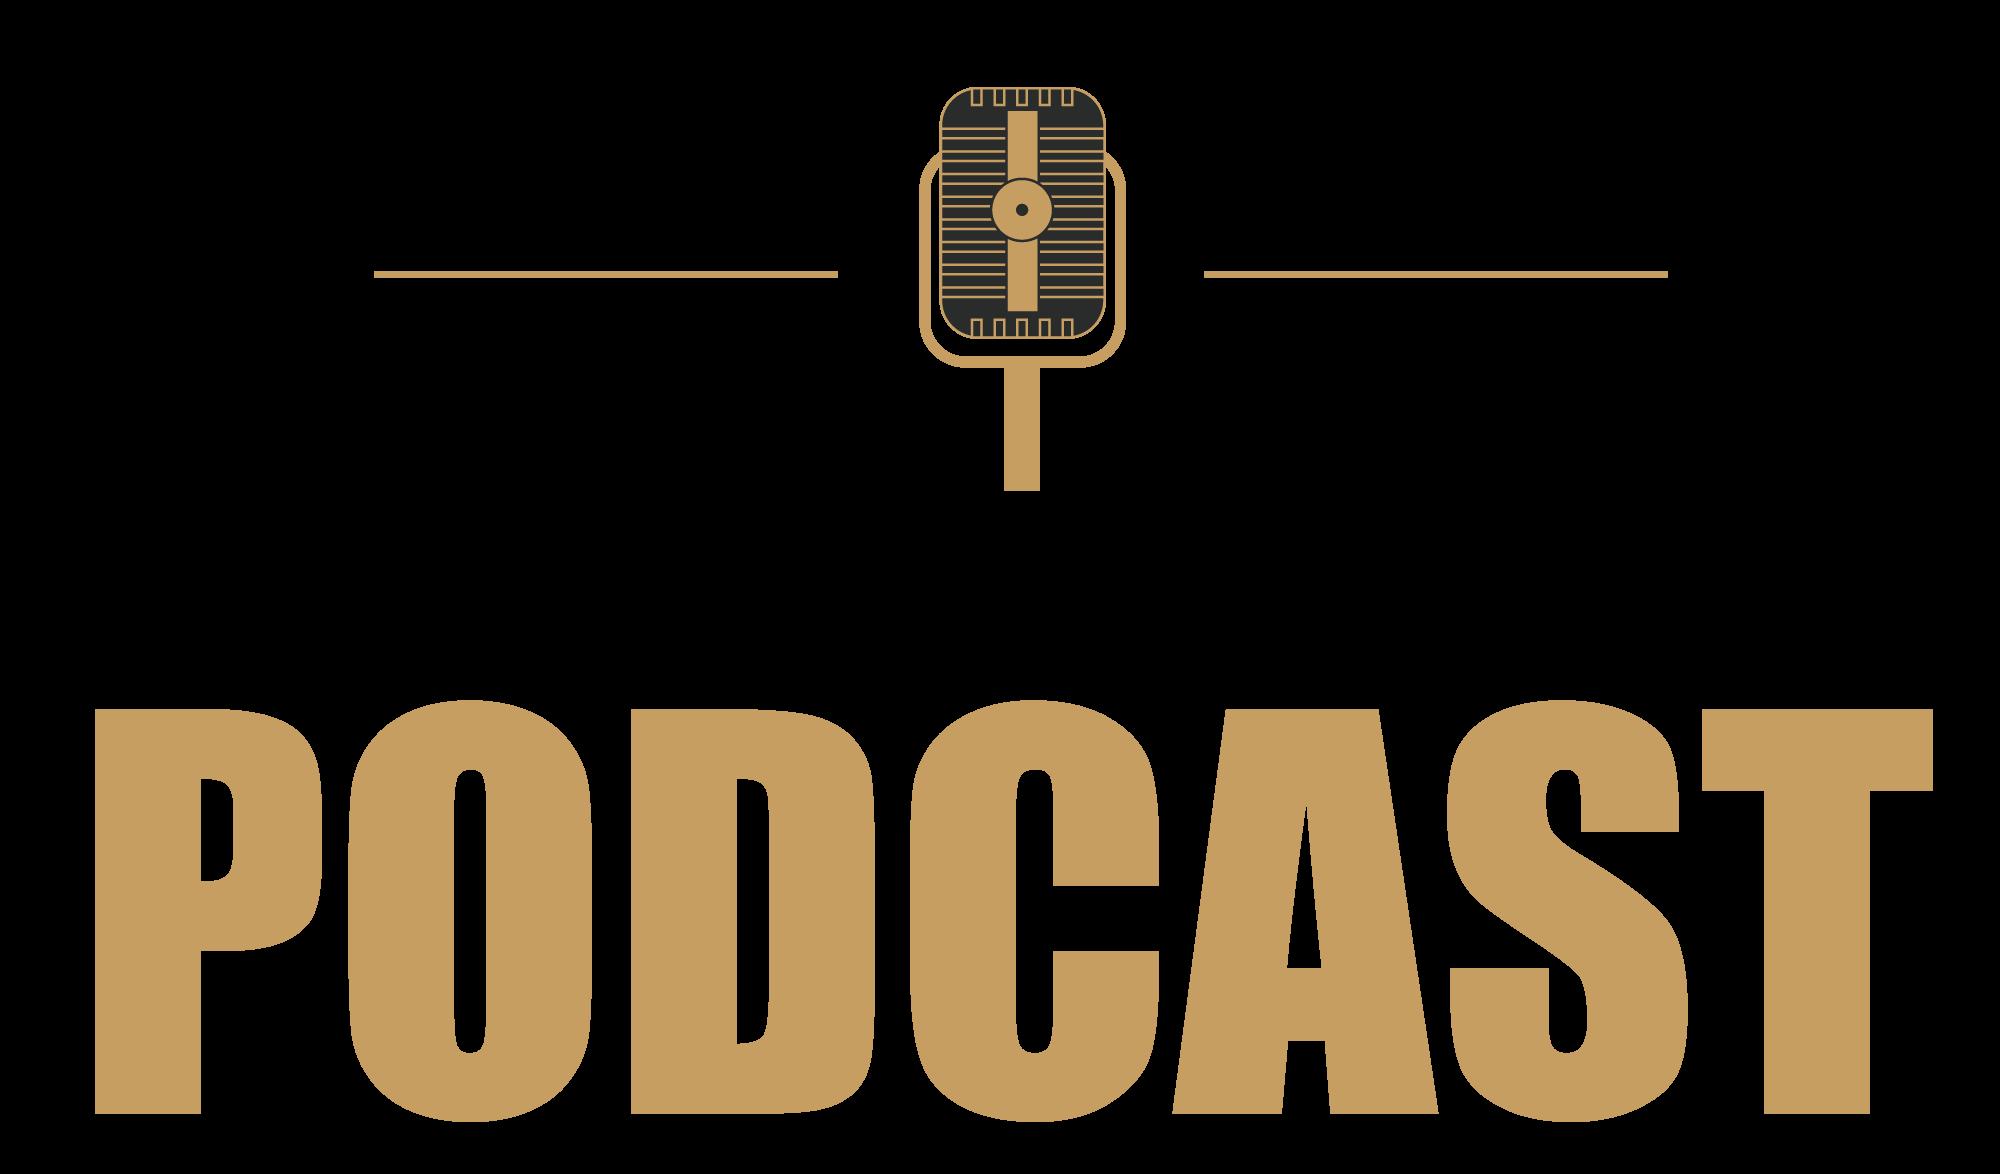 Podcast-heading-ByB